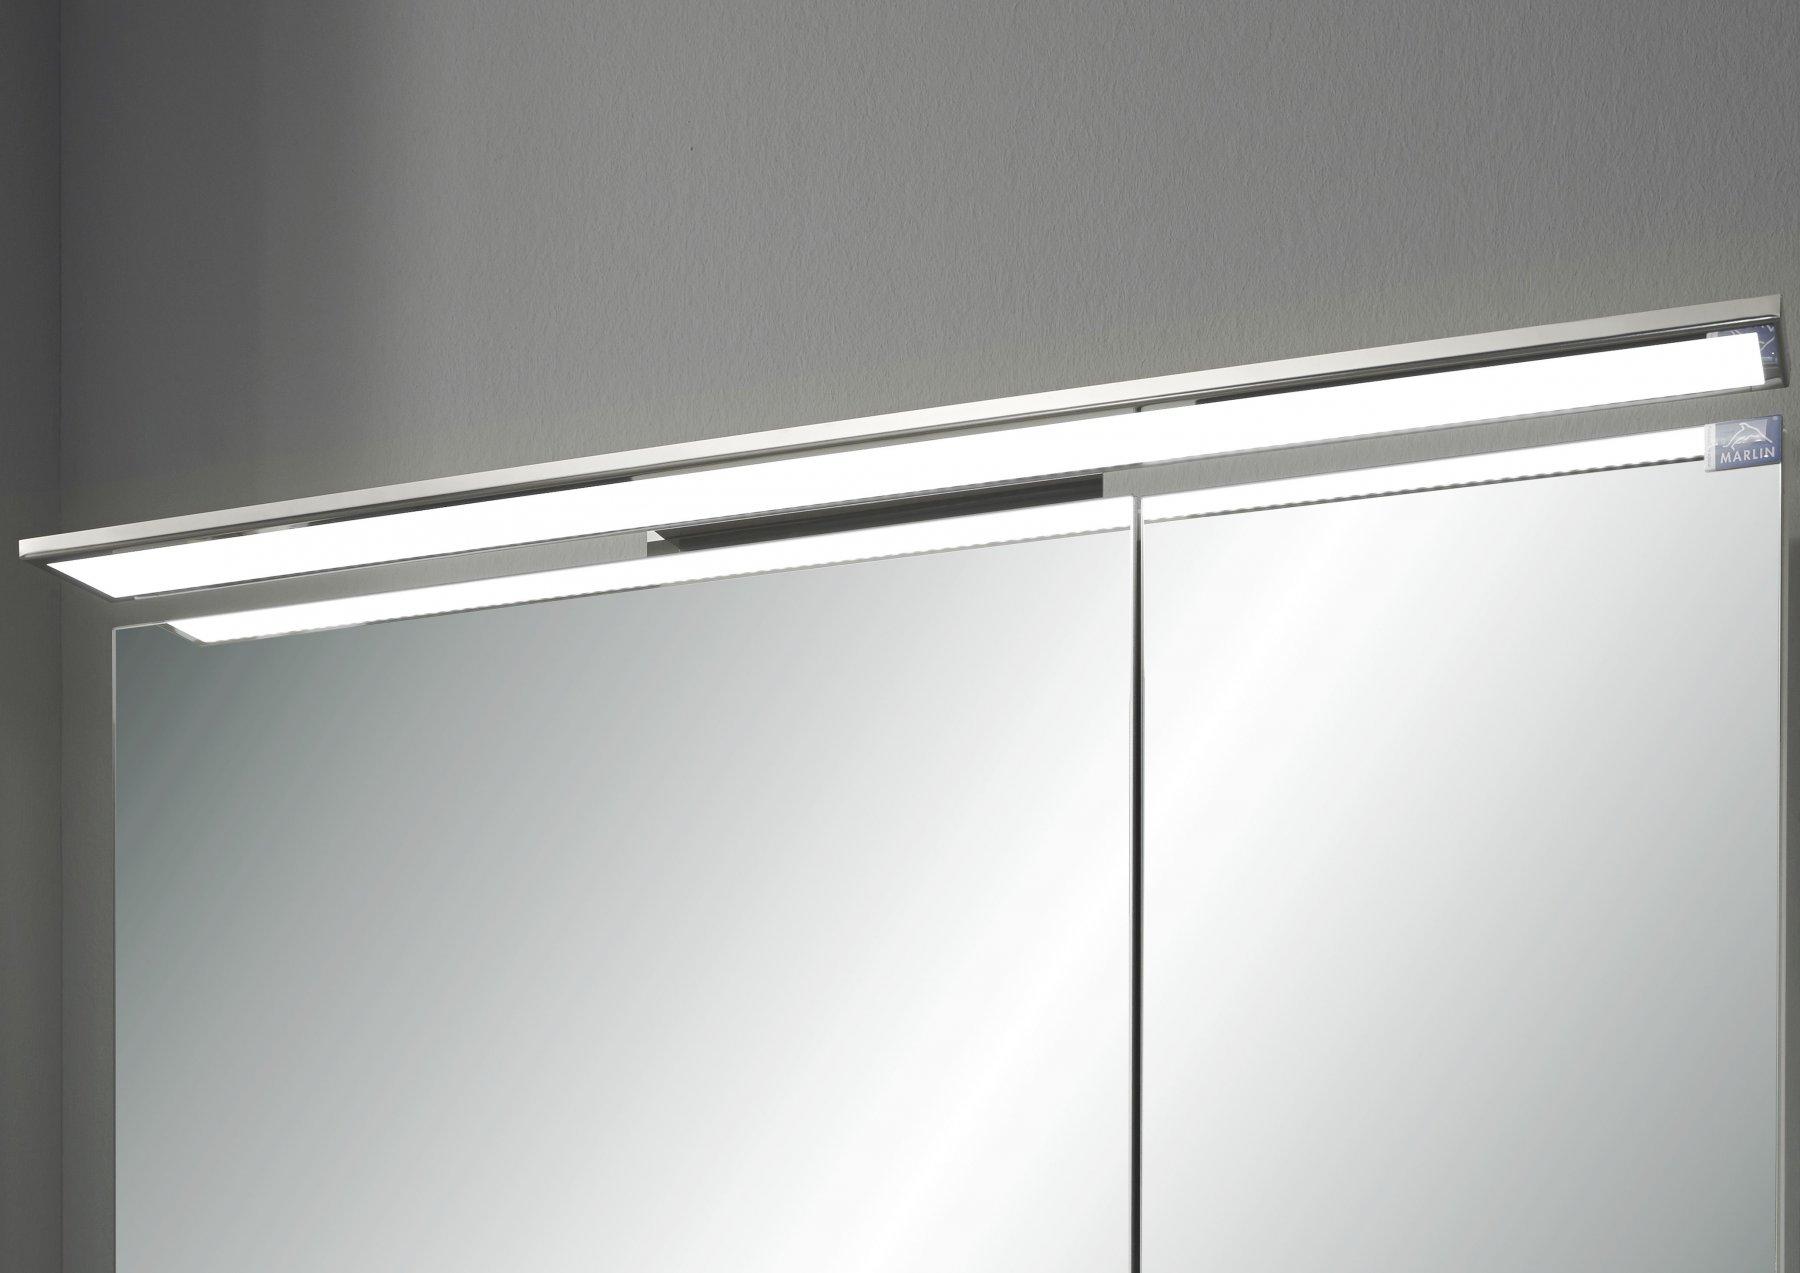 marlin bad 3090 cosmo spiegelschrank 60 cm links arcom. Black Bedroom Furniture Sets. Home Design Ideas